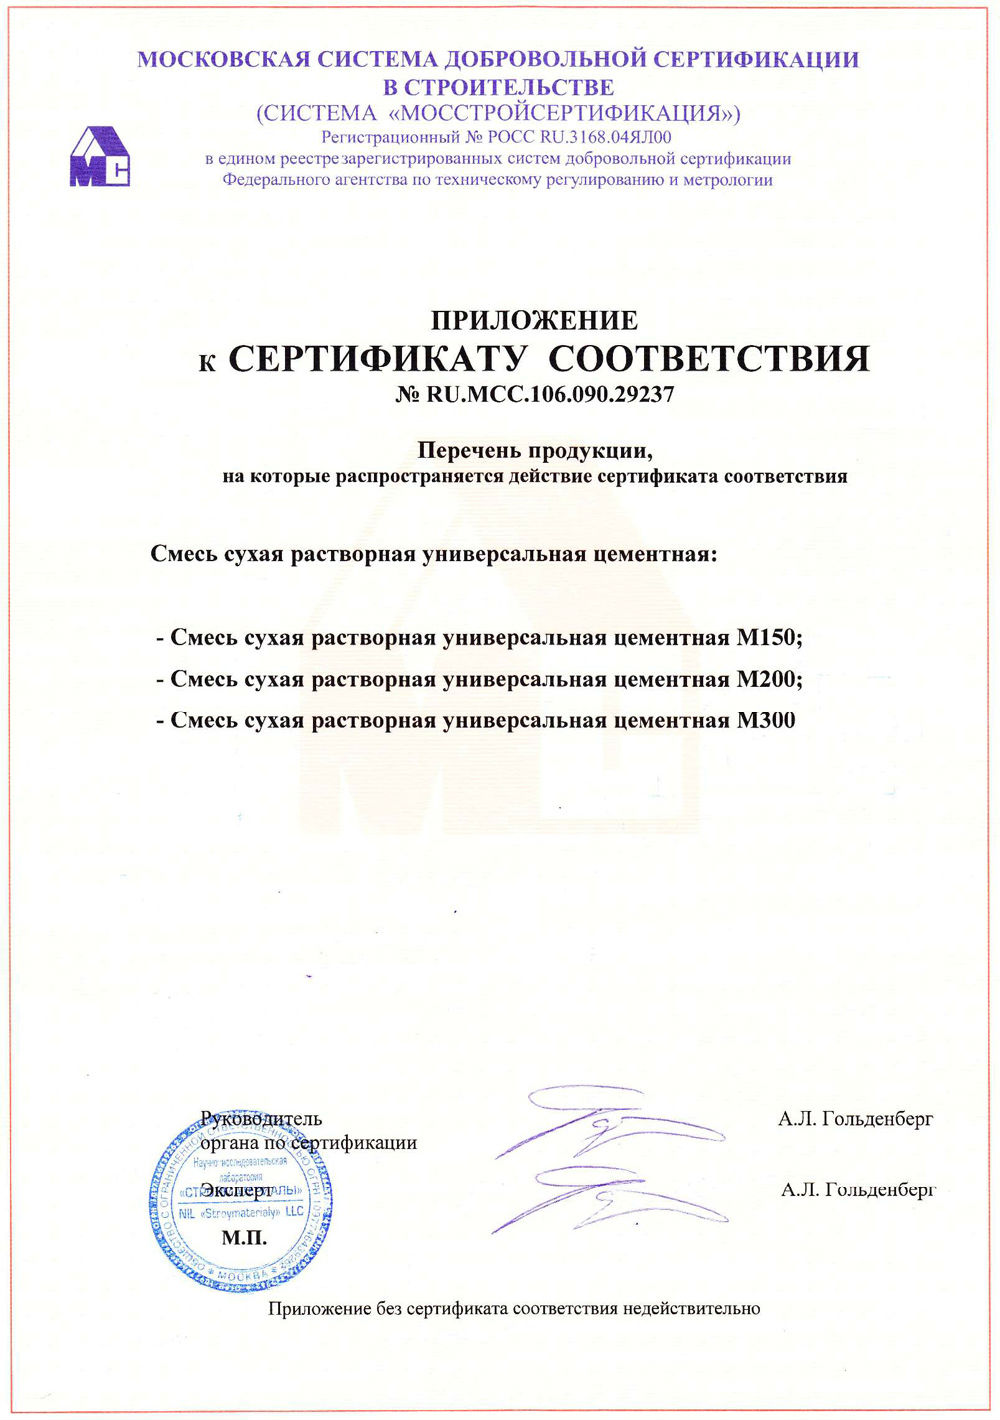 Керамзитобетон сертификат бетон марки м150 купить